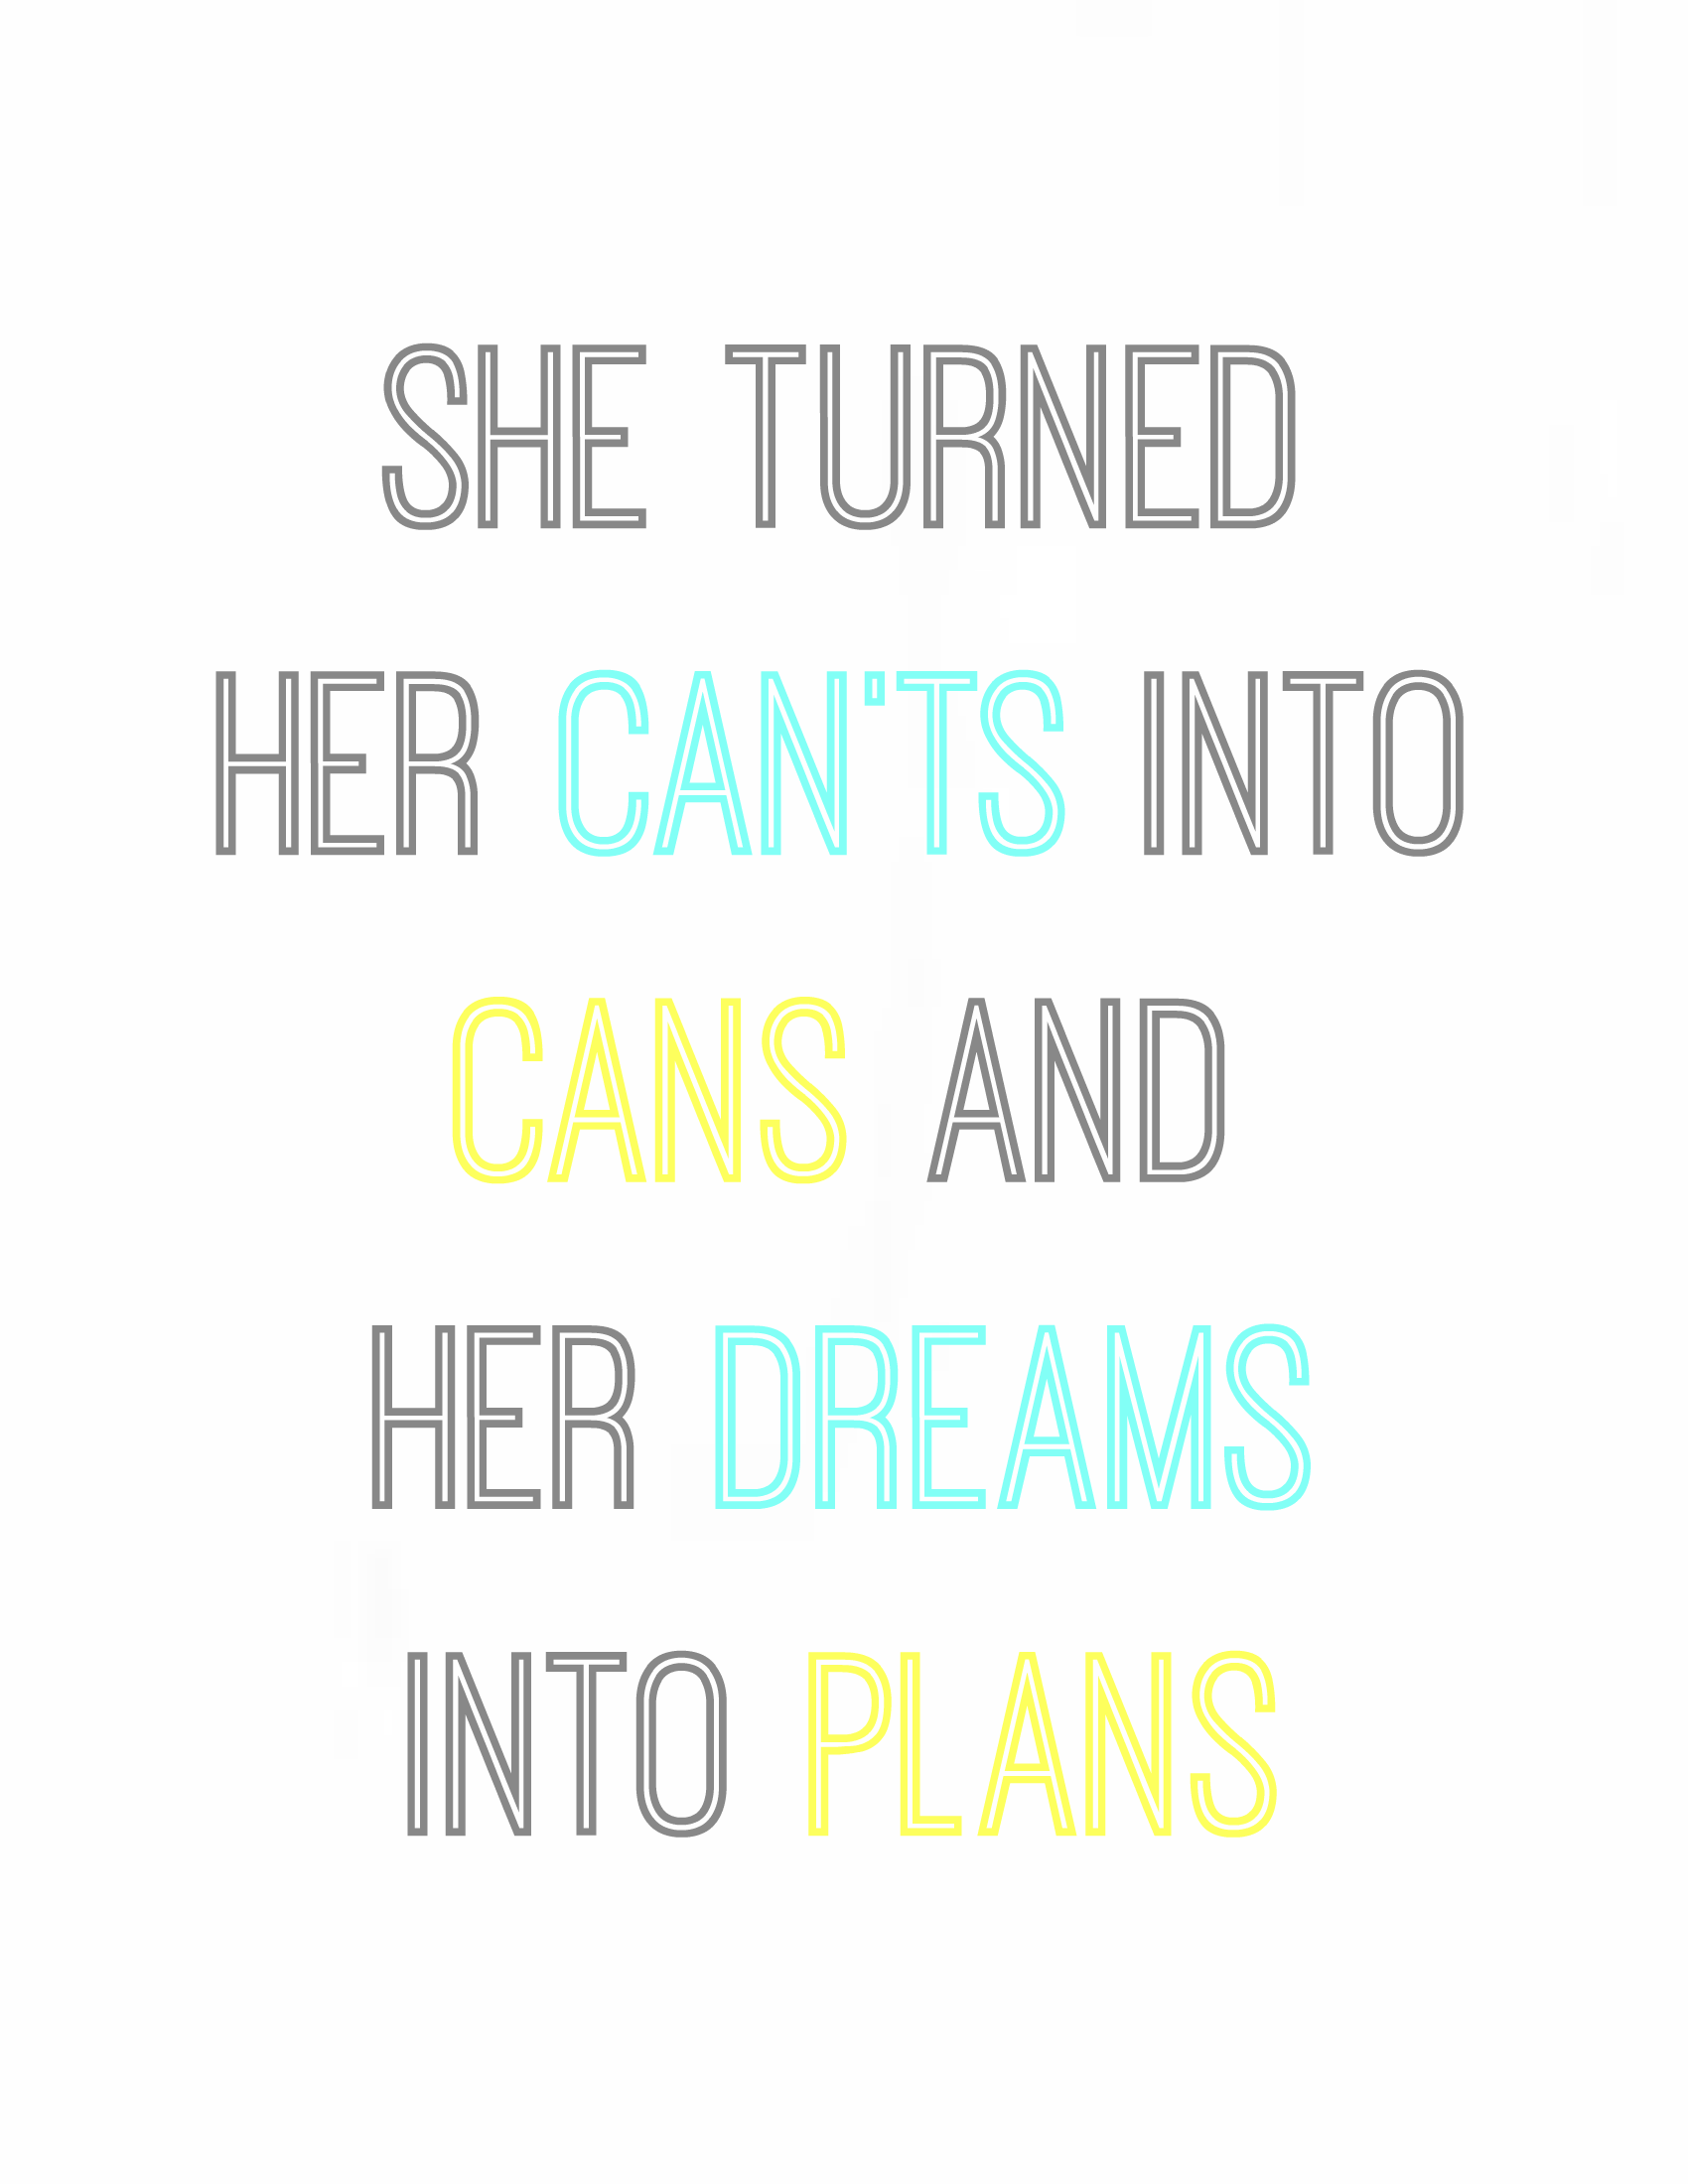 Dreams Into Plans Free Printable